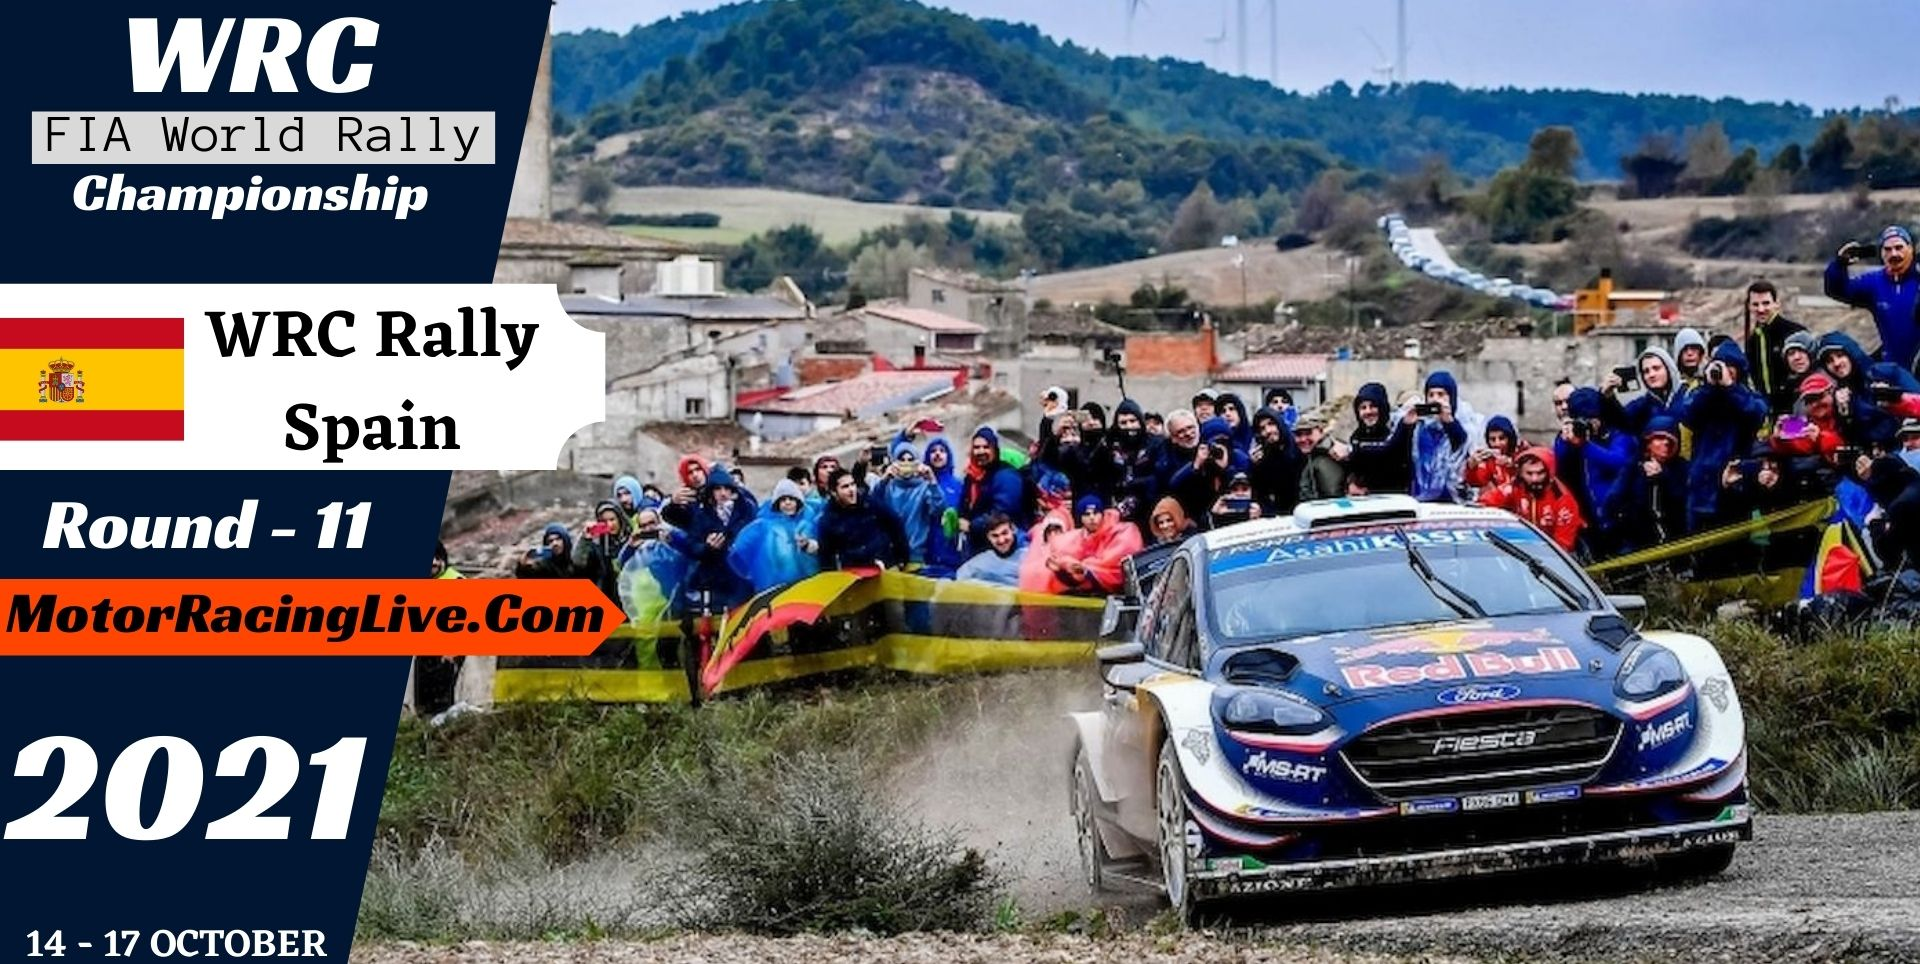 WRC Rally Spain Round 11 Live Stream 2021